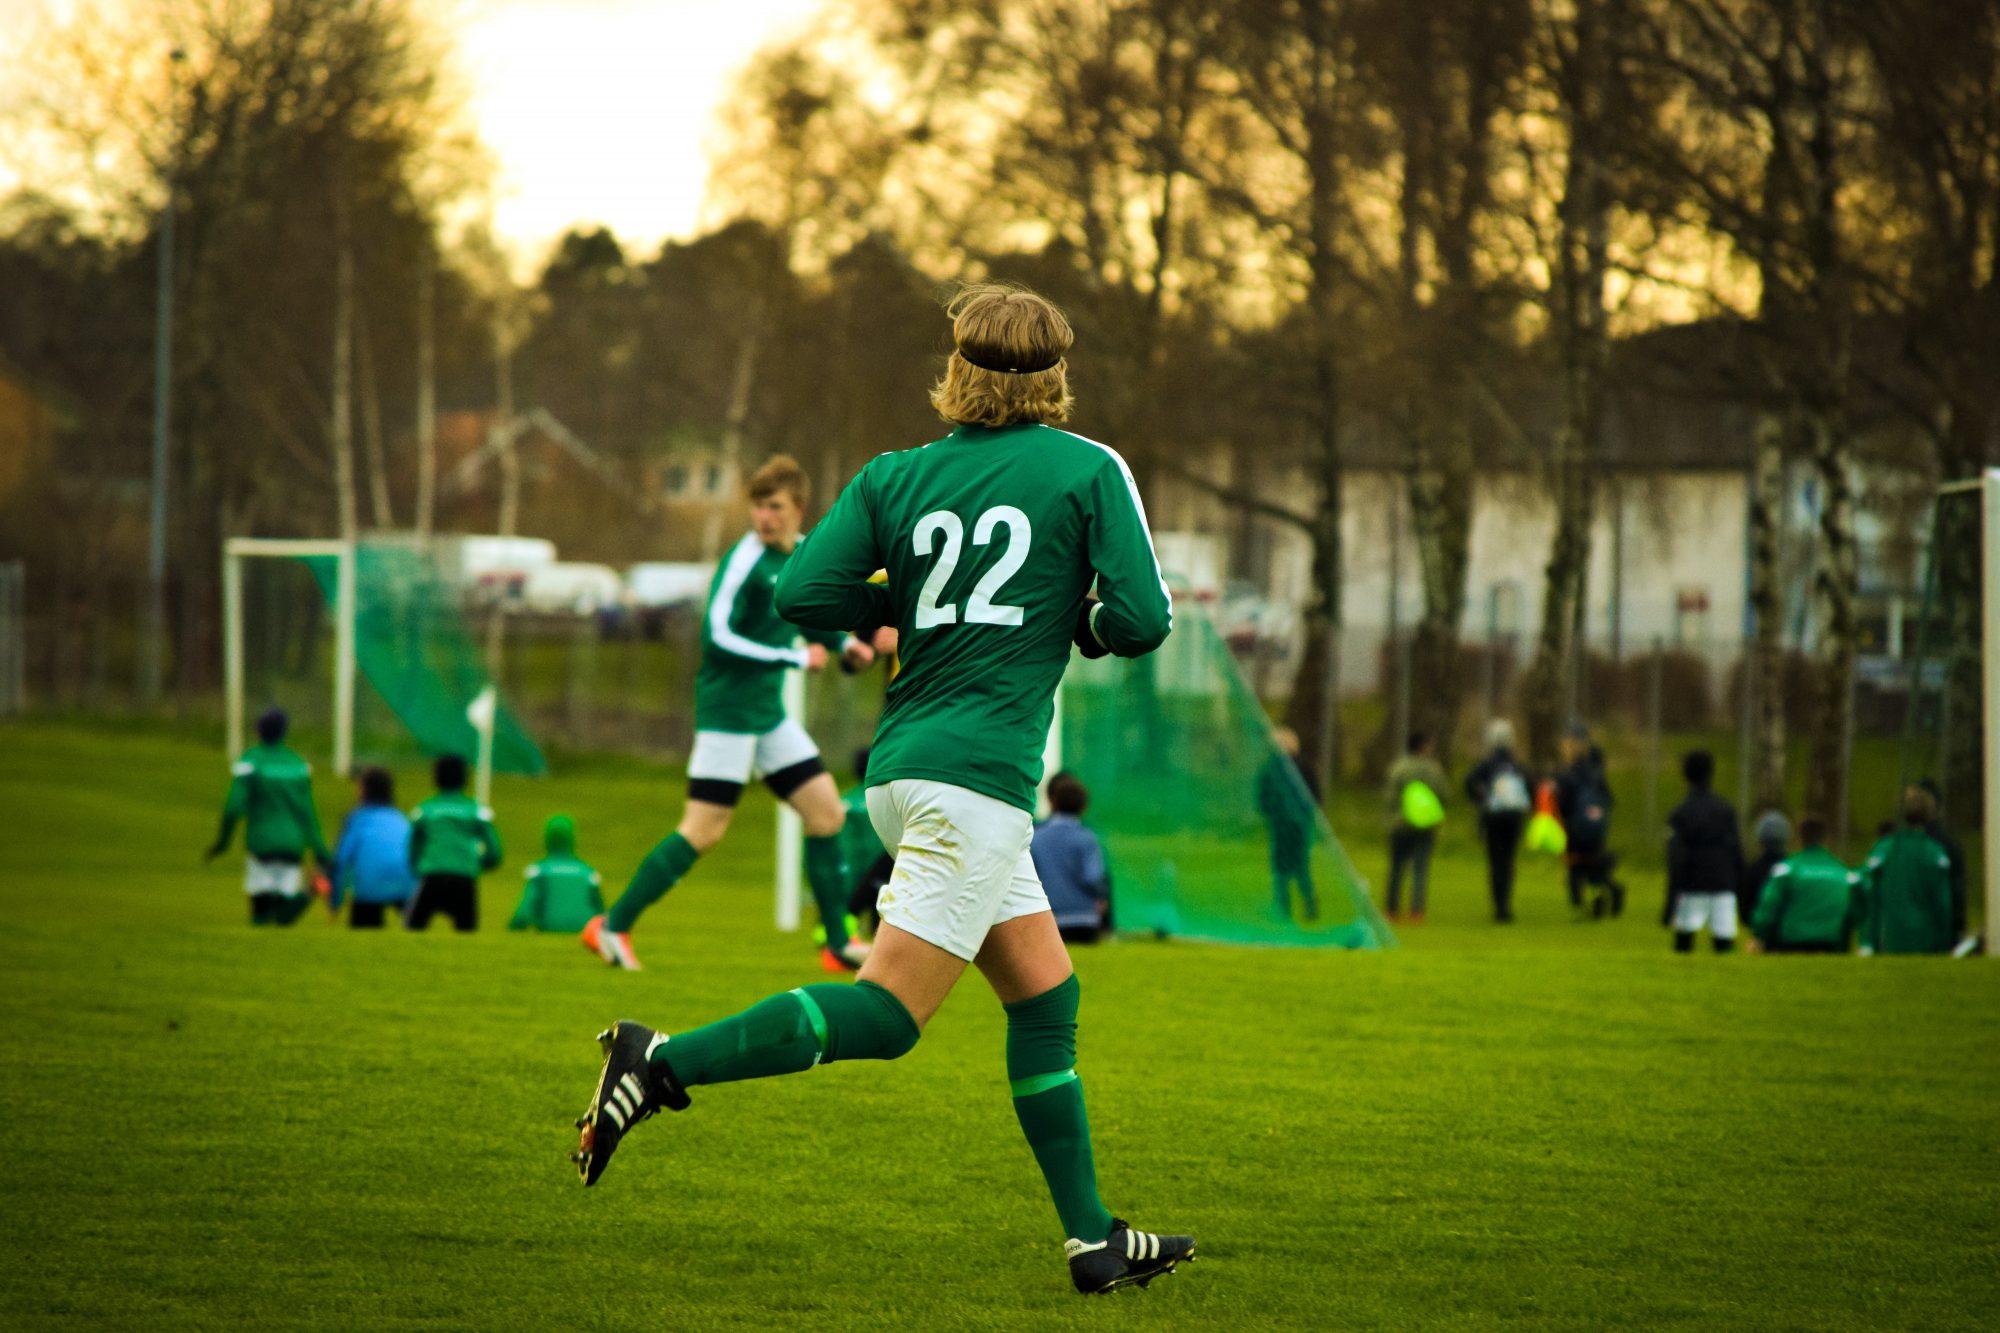 athletes-field-football-532805-e1526323851619